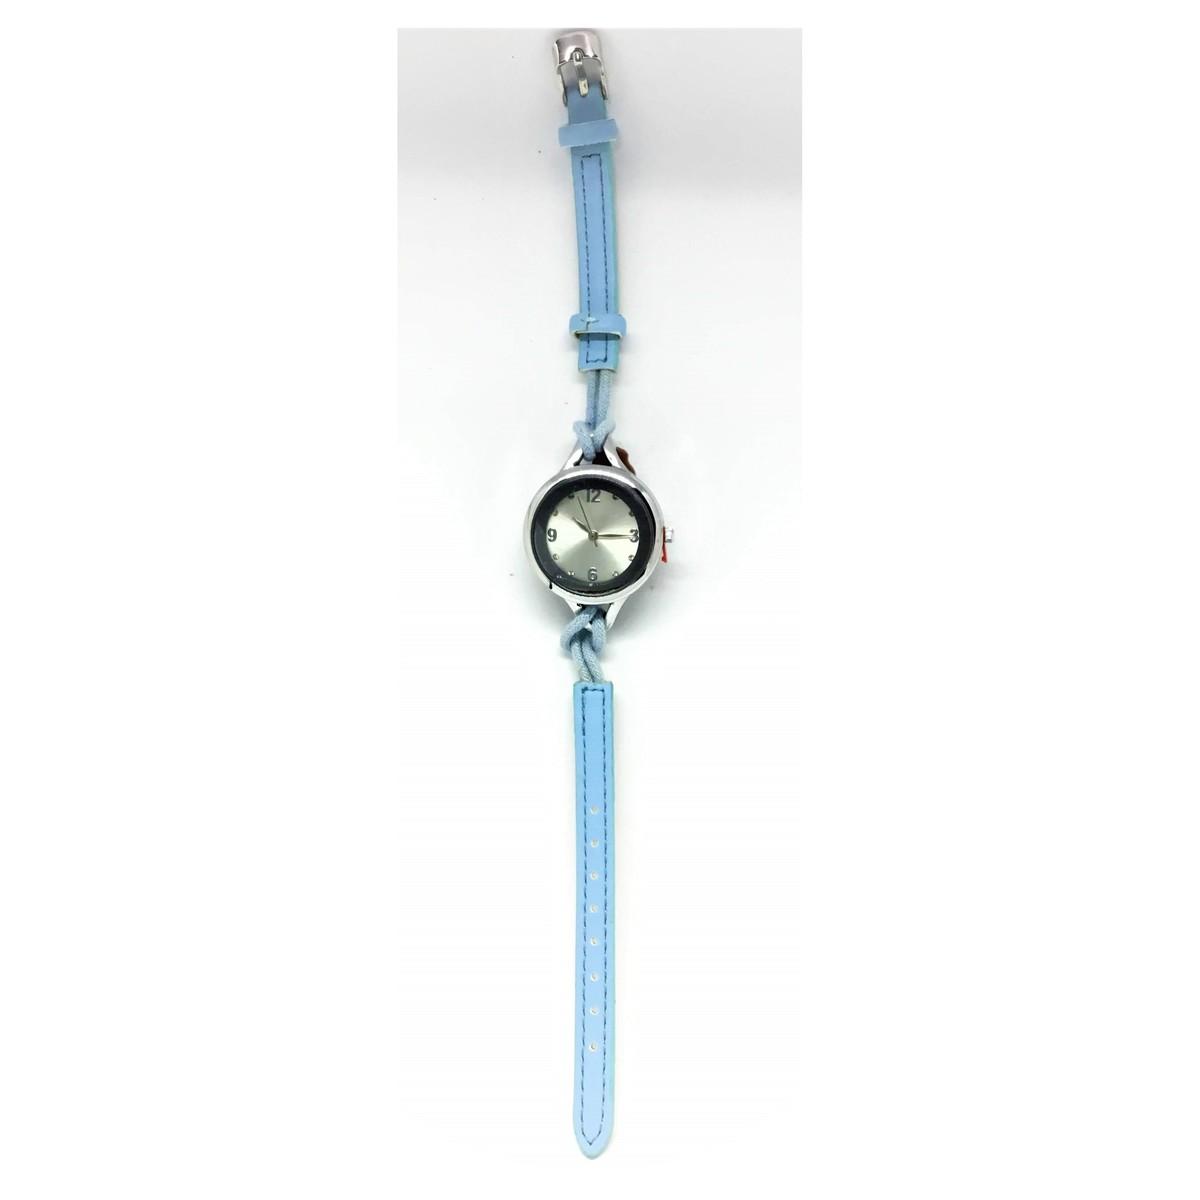 Elegant Quartz Lady Leather Fashion Wrist Watch - Light Blue